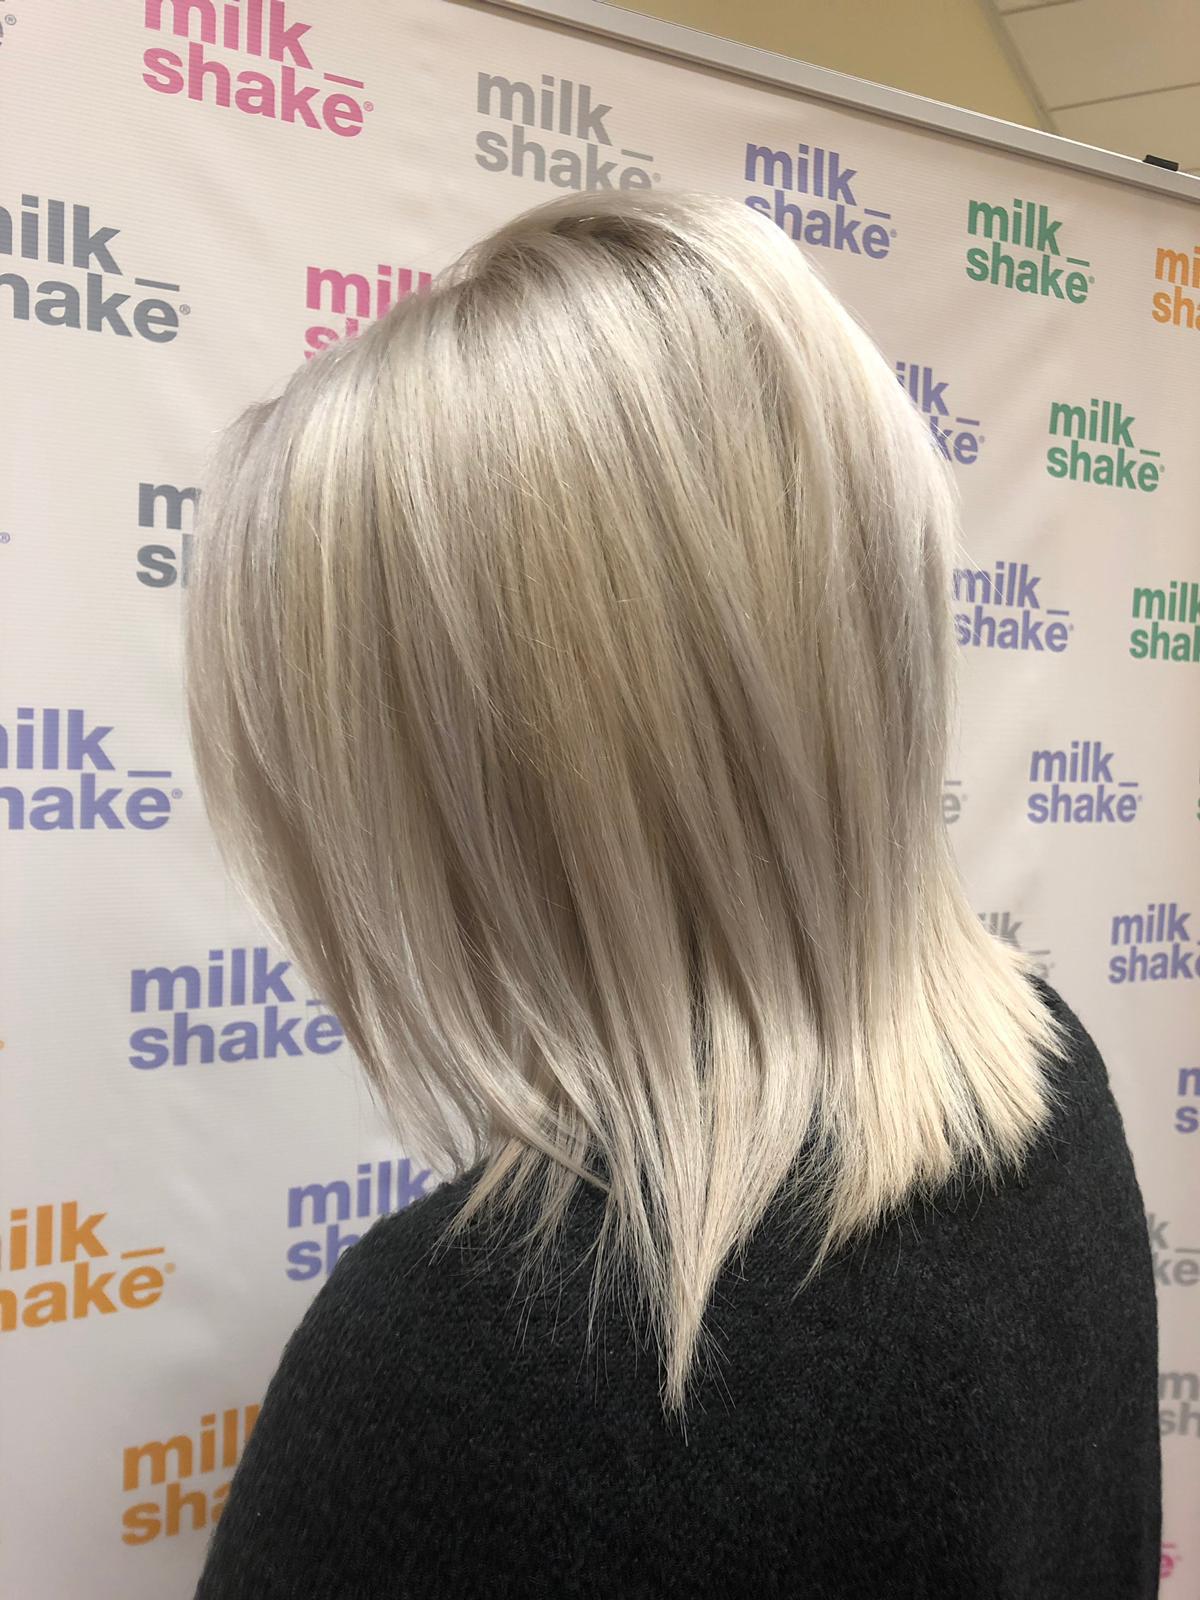 Venus-Beauty-Hair-Salon-Tavistock-Devon-Courses-Learning-Hannah-Woodgates-Confidential-Colours-Milkshake-Phab-Silver-Hair-After.JPG